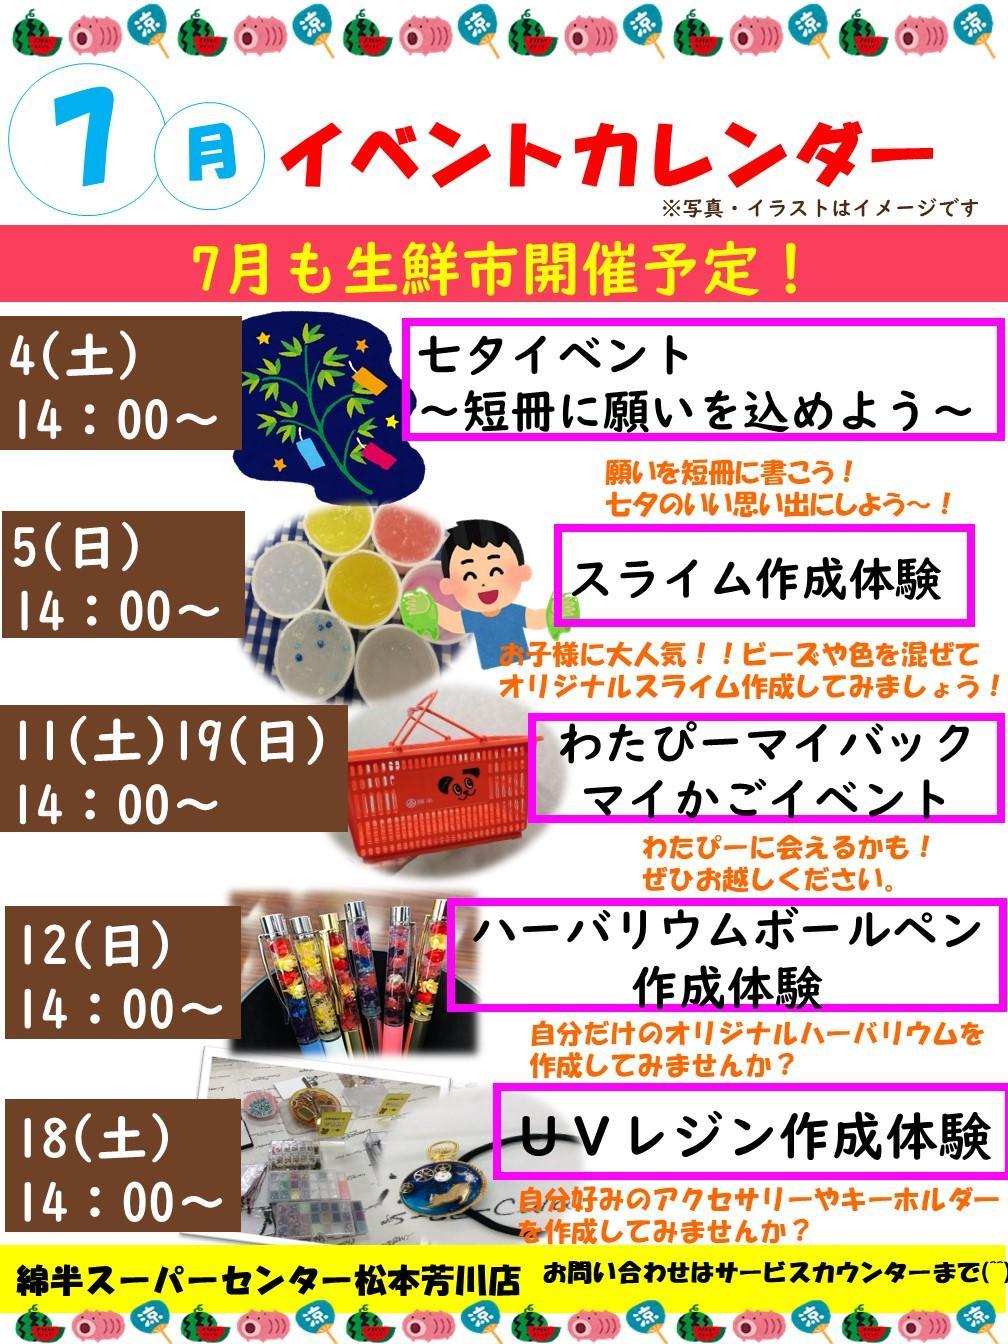 HAイベントカレンダーフォーマット1.jpg